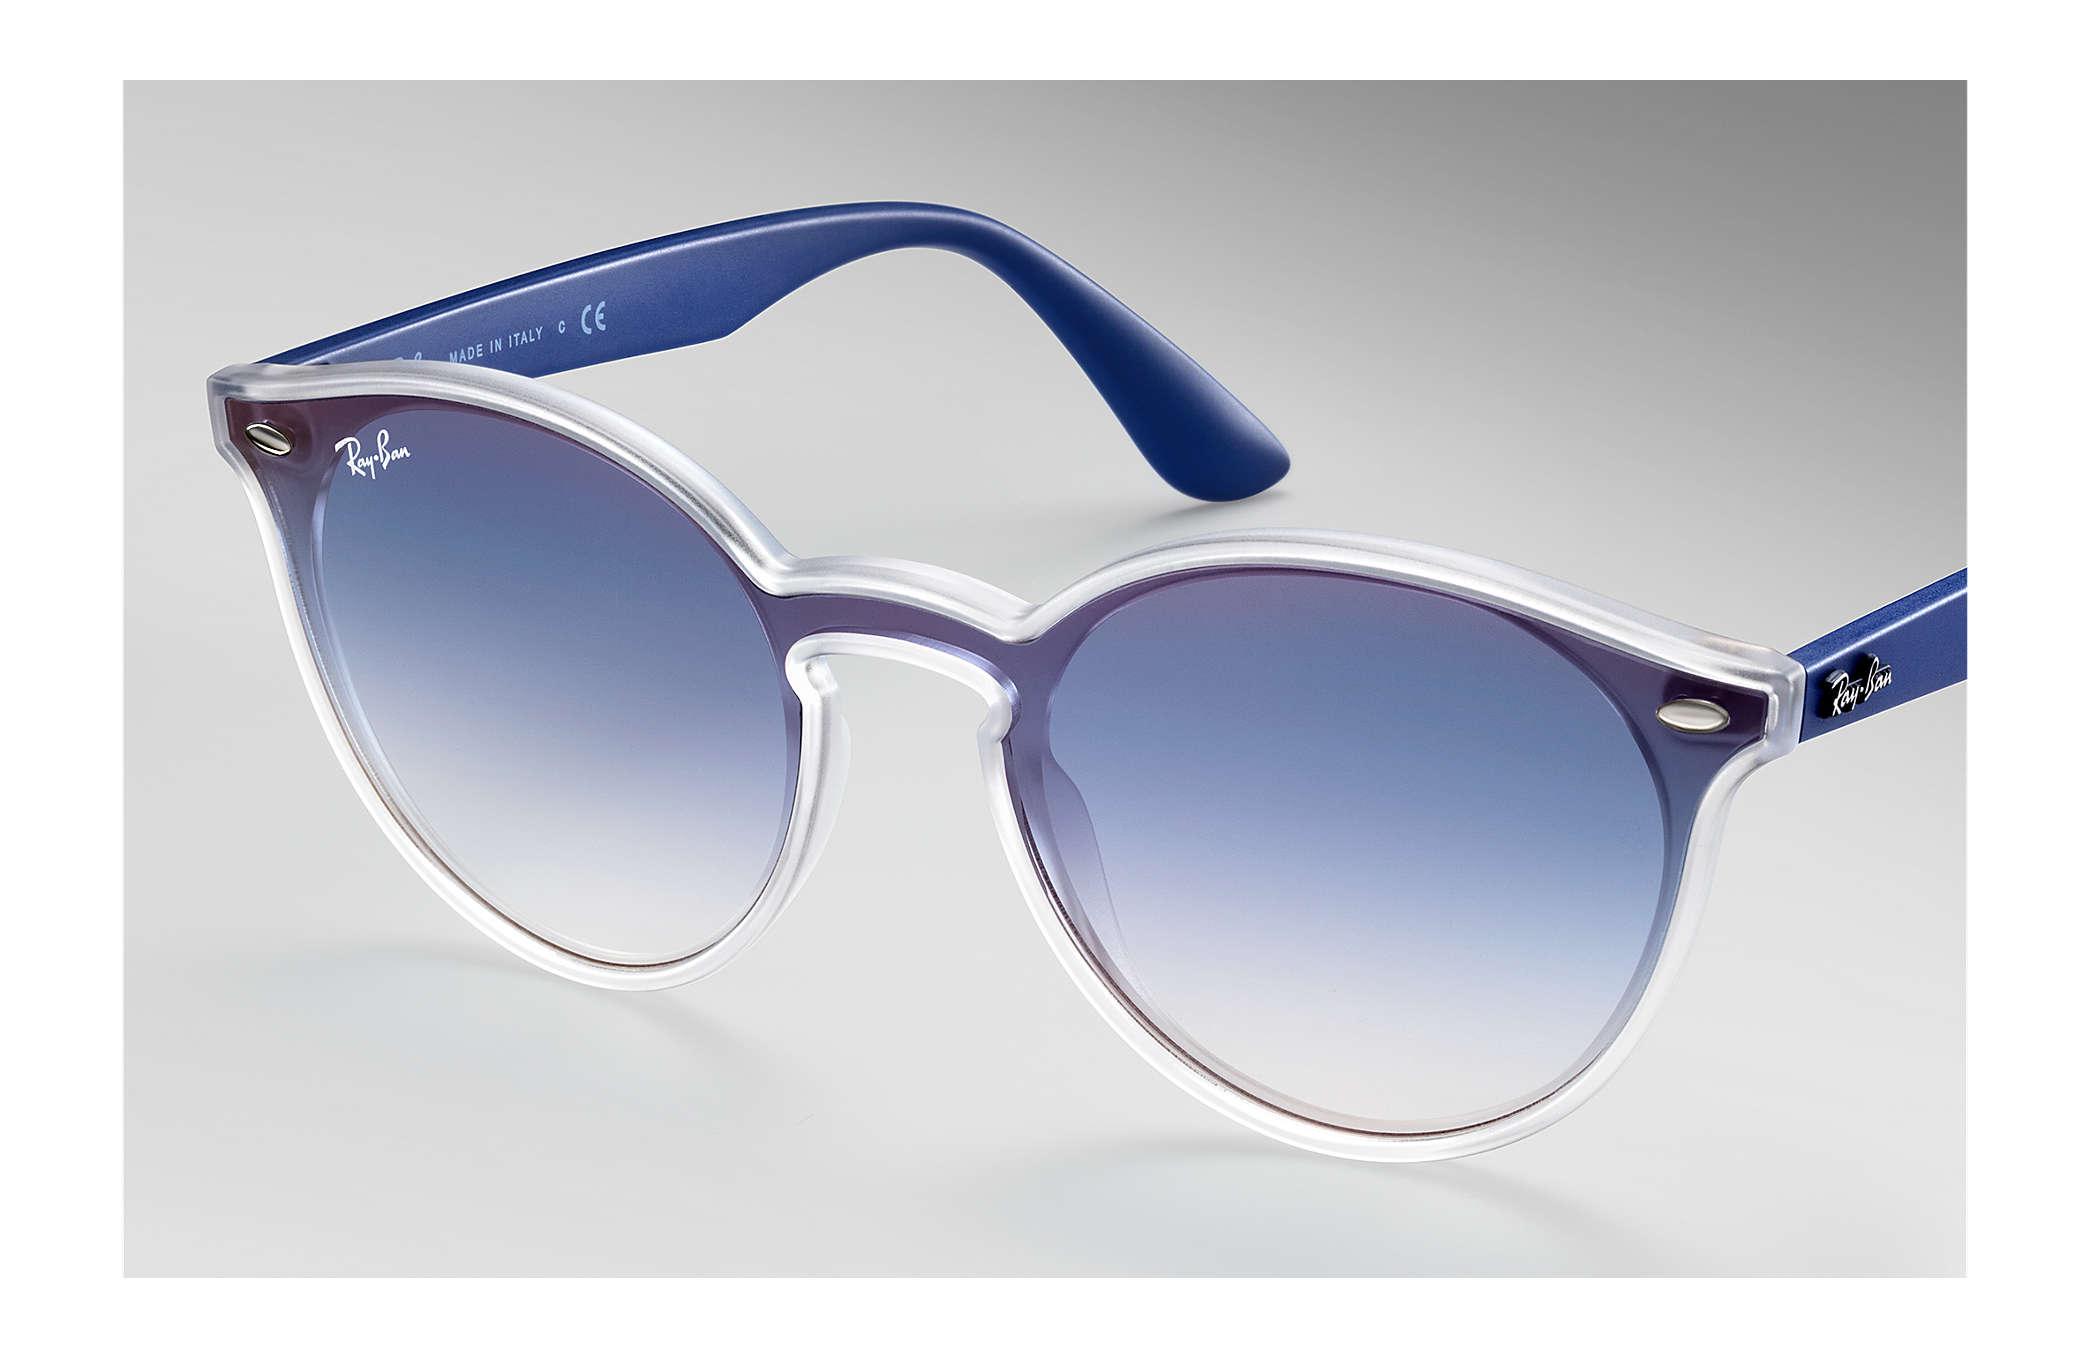 f5df08a6e Ray-Ban Blaze Rb4380n RB4380N Transparente - Nylon - Lentes Azul ...